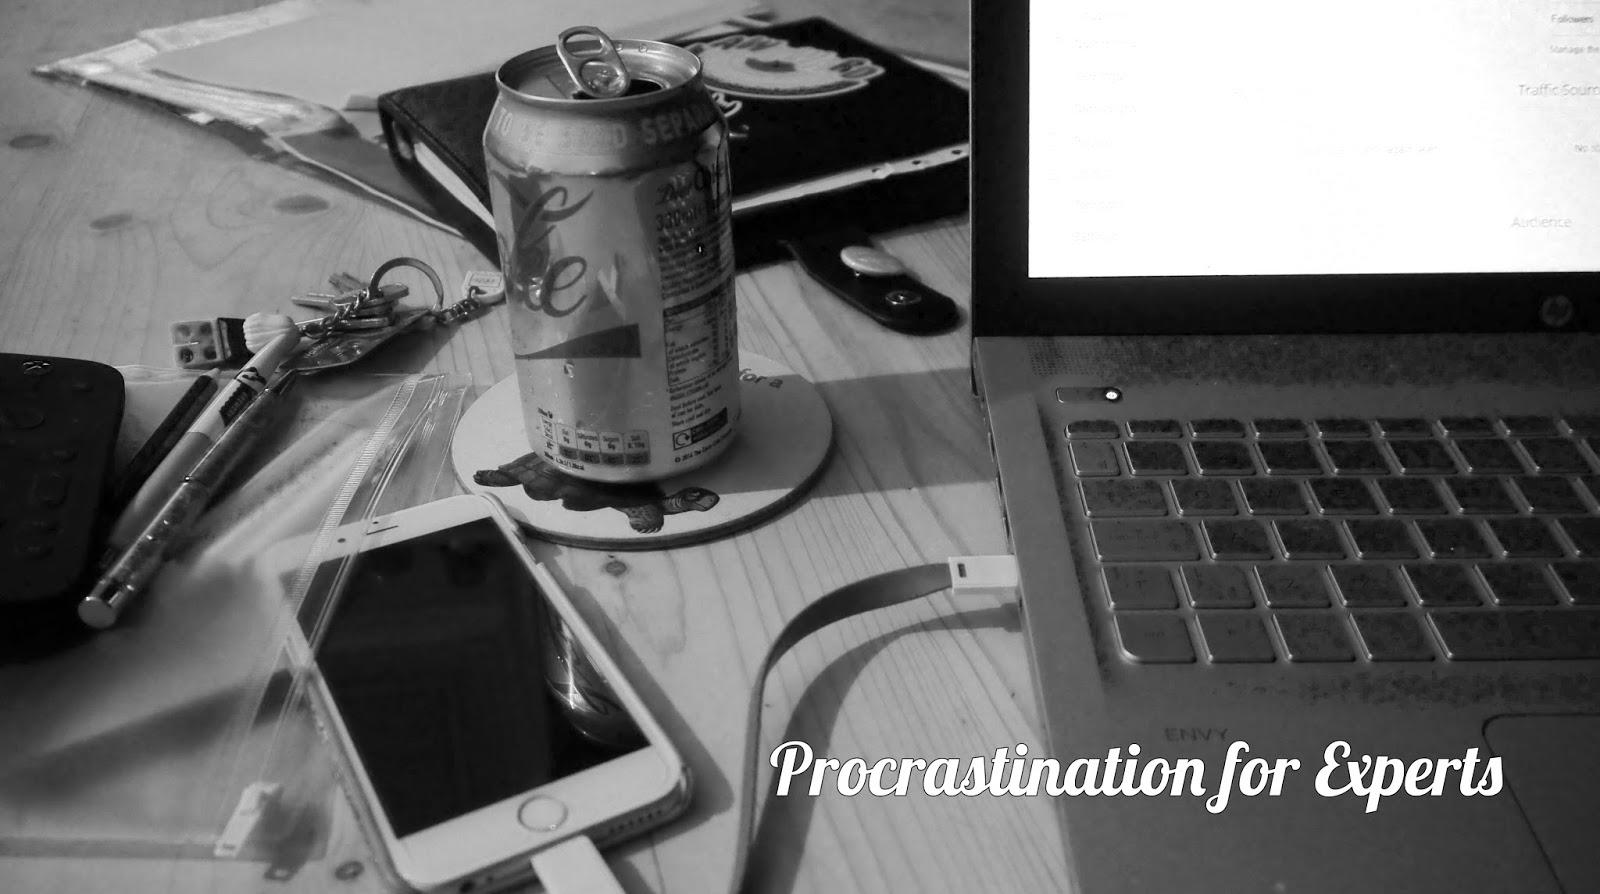 Procrastination for Experts